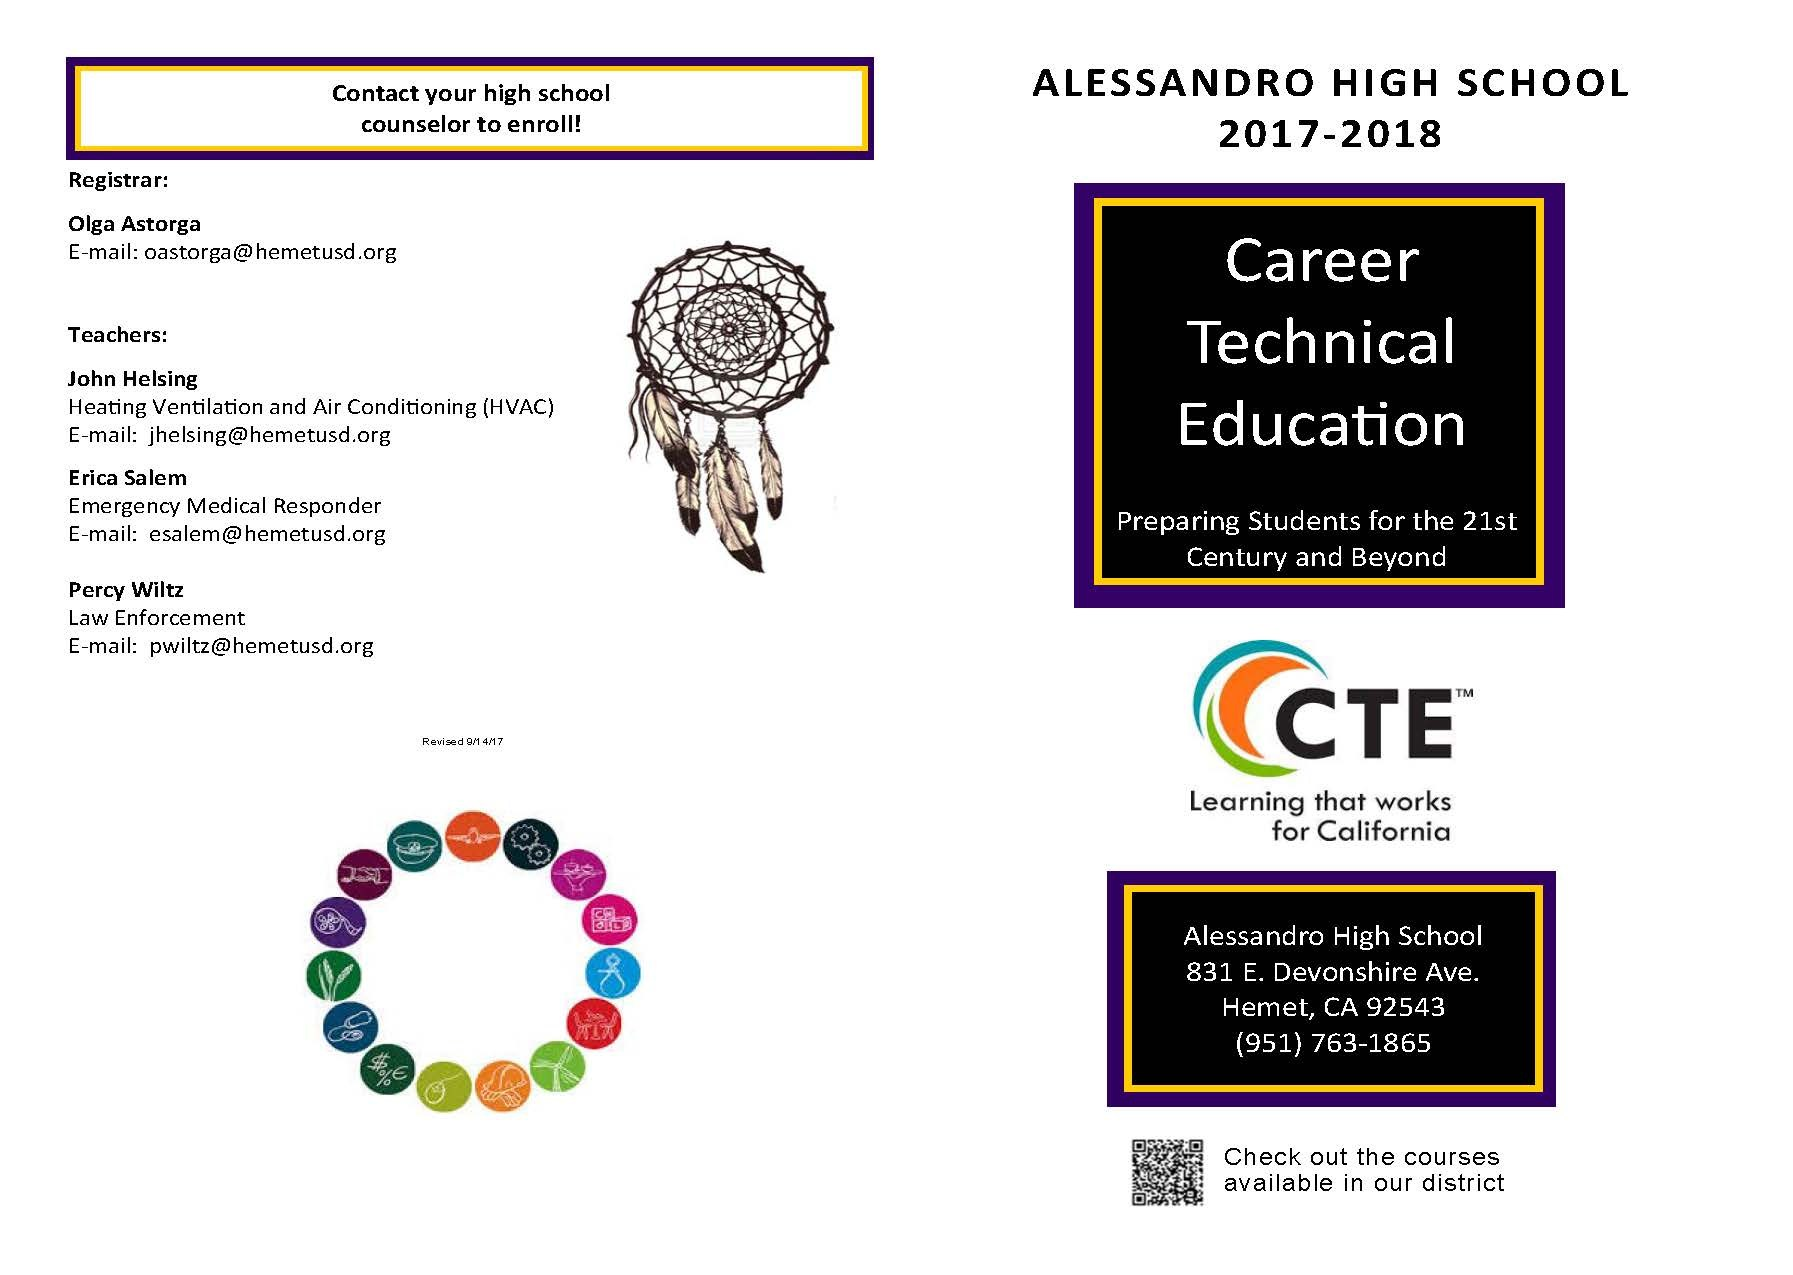 Alessandro High School Brochure